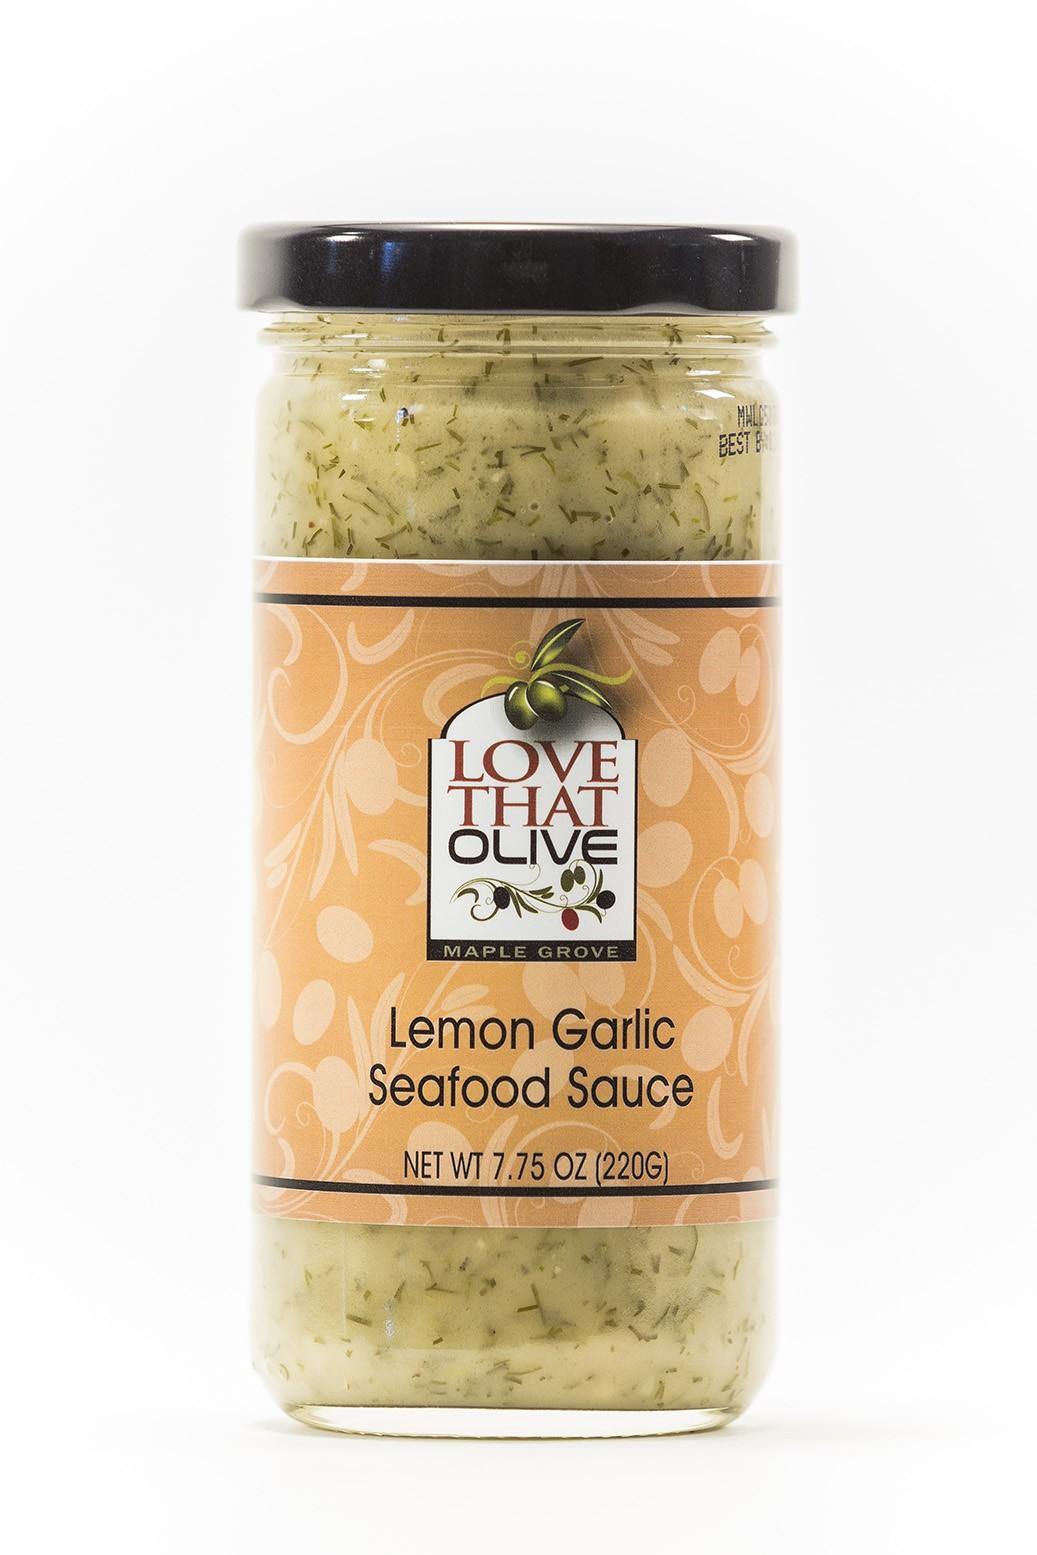 Lemon Garlic Seafood Sauce